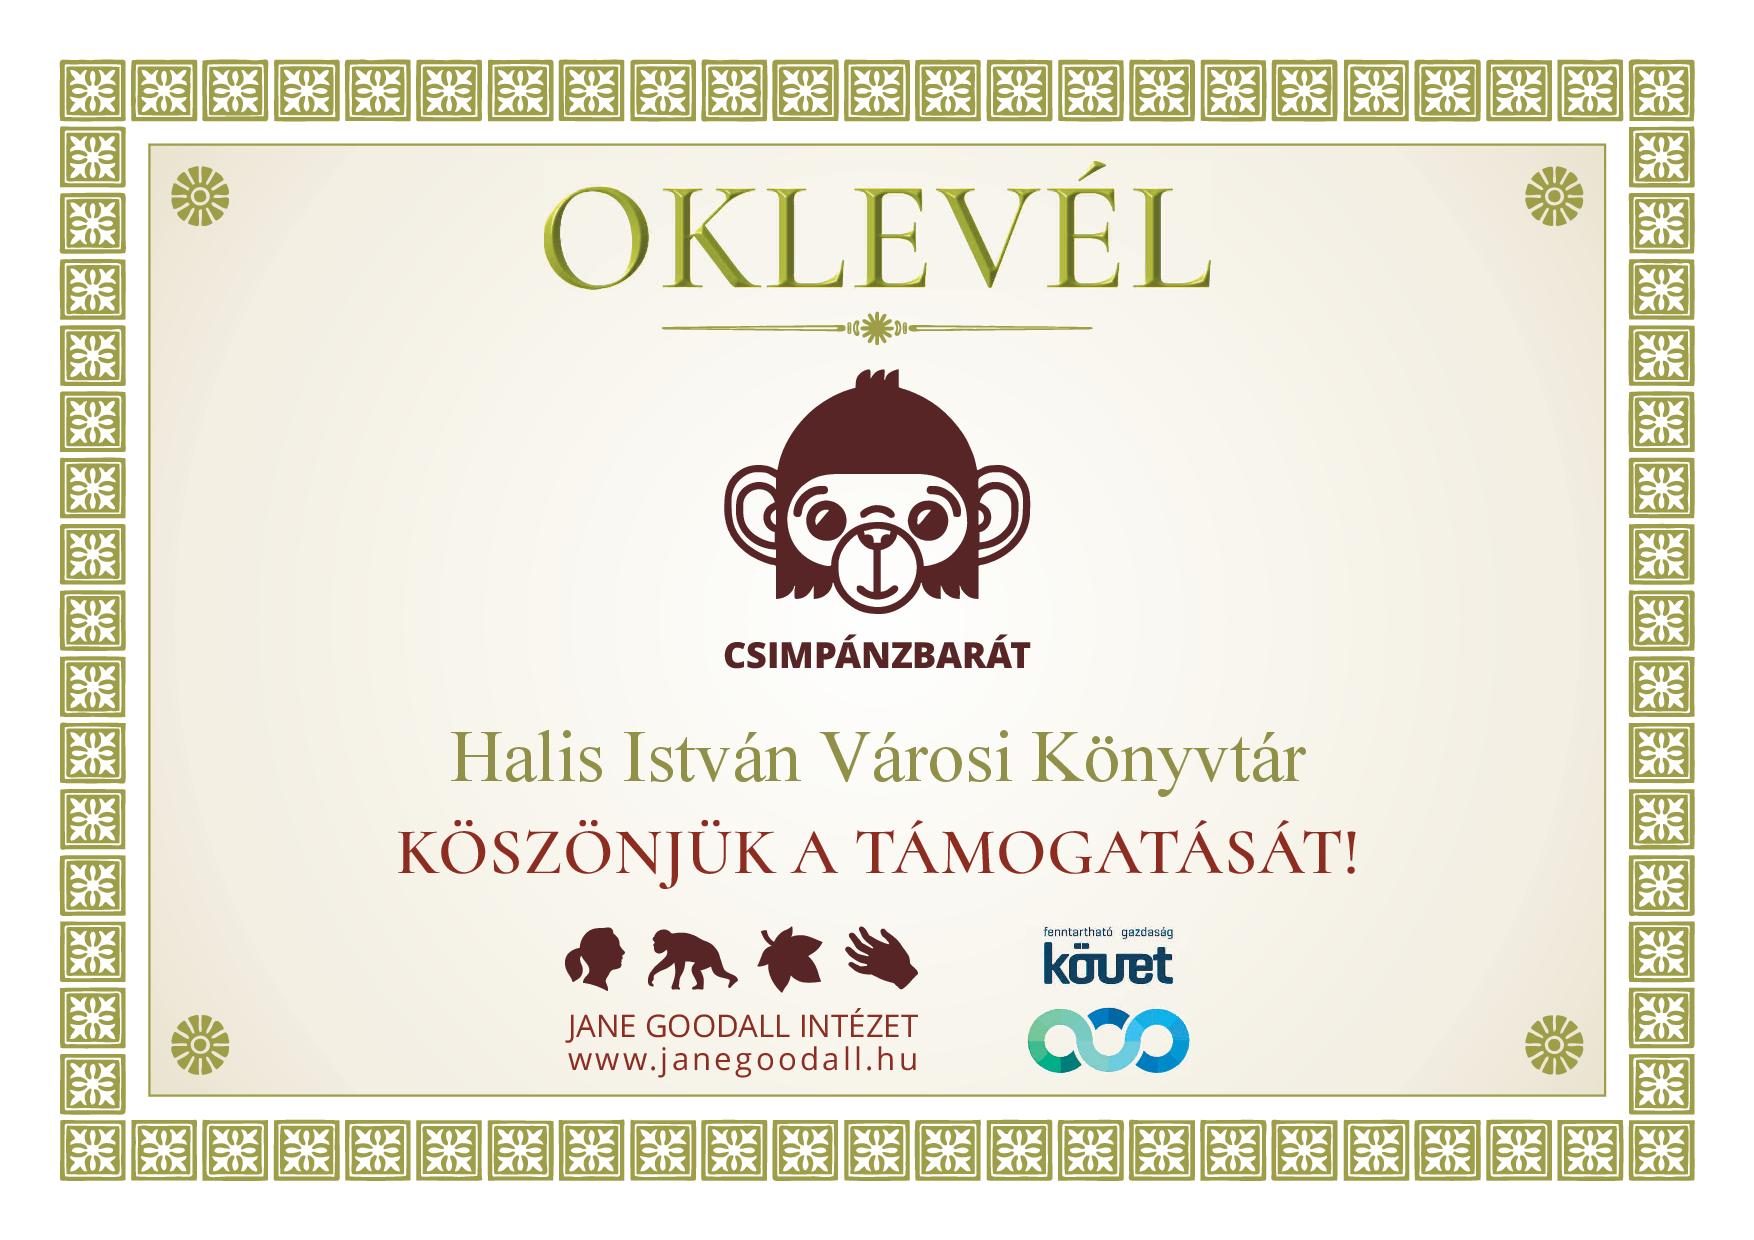 https://www.nagykar.hu/images/hirlevel/598/Halis_Istvan_Varosi_Konyvtar.PNG